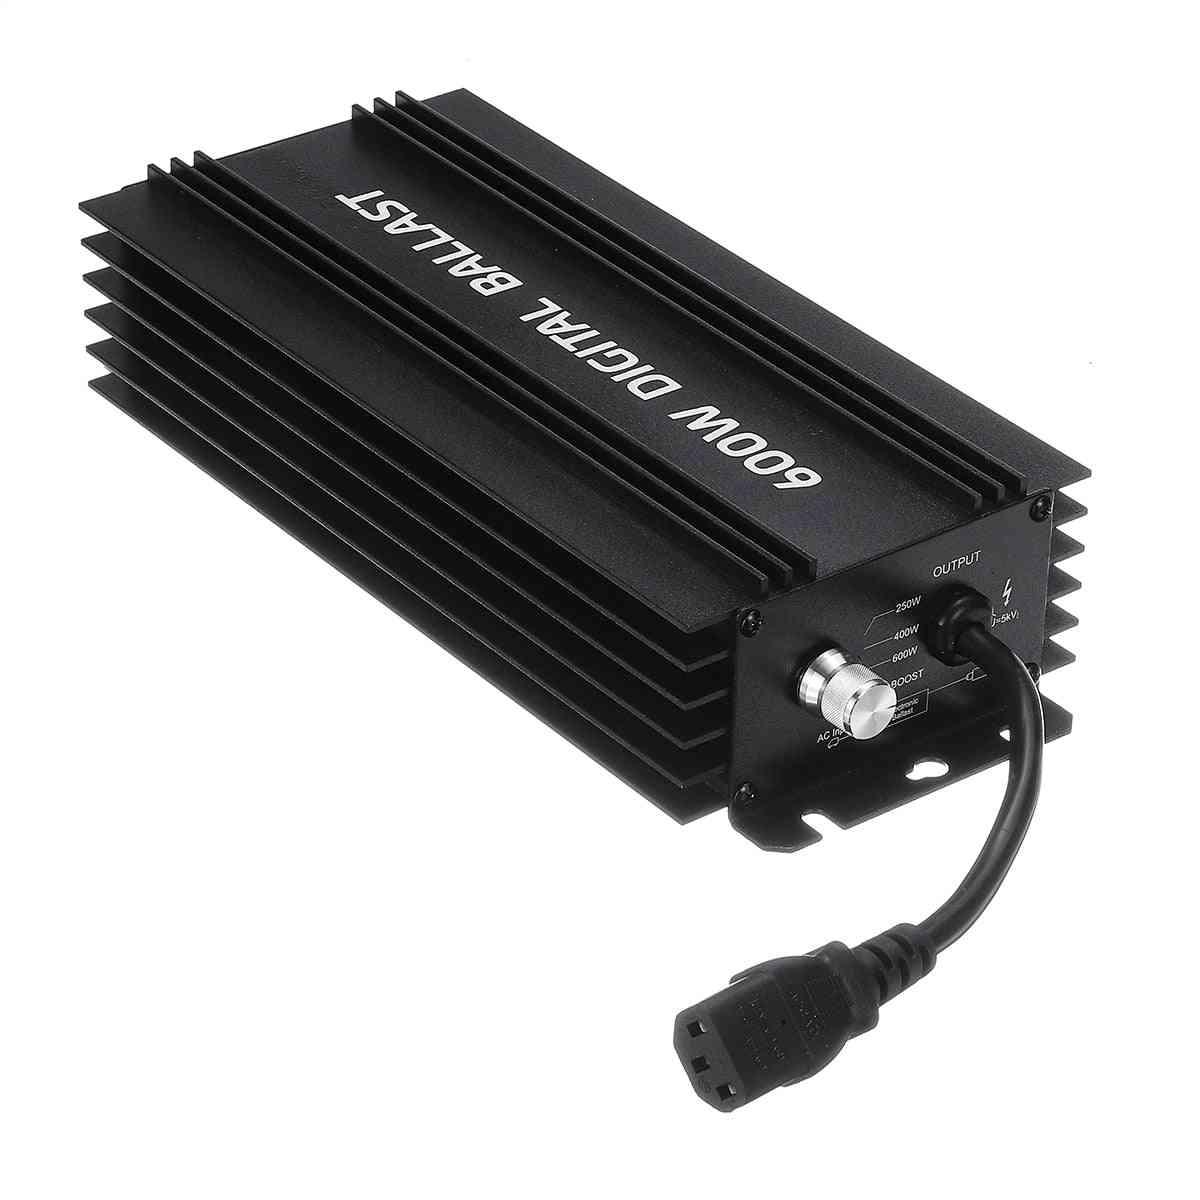 Digital 600w -eu Plug Ballasts -grow Lights Hps